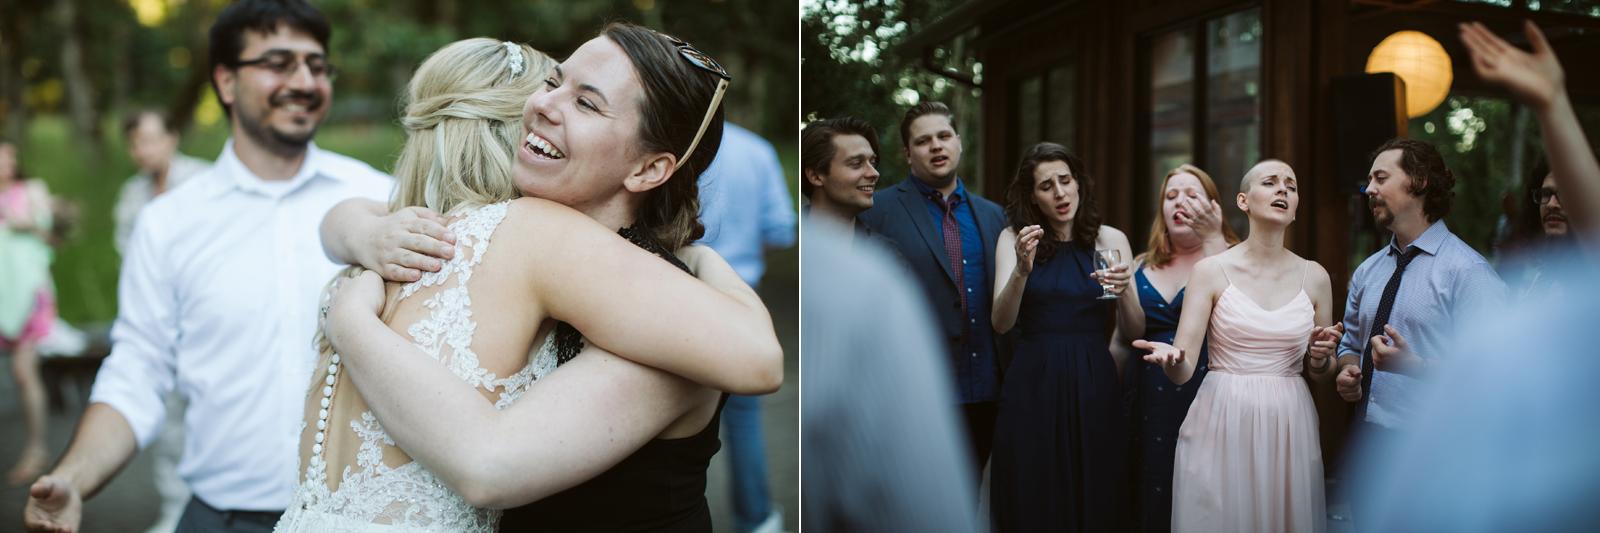 139-daronjackson-rachel-michael-wedding-mtpisgah.jpg